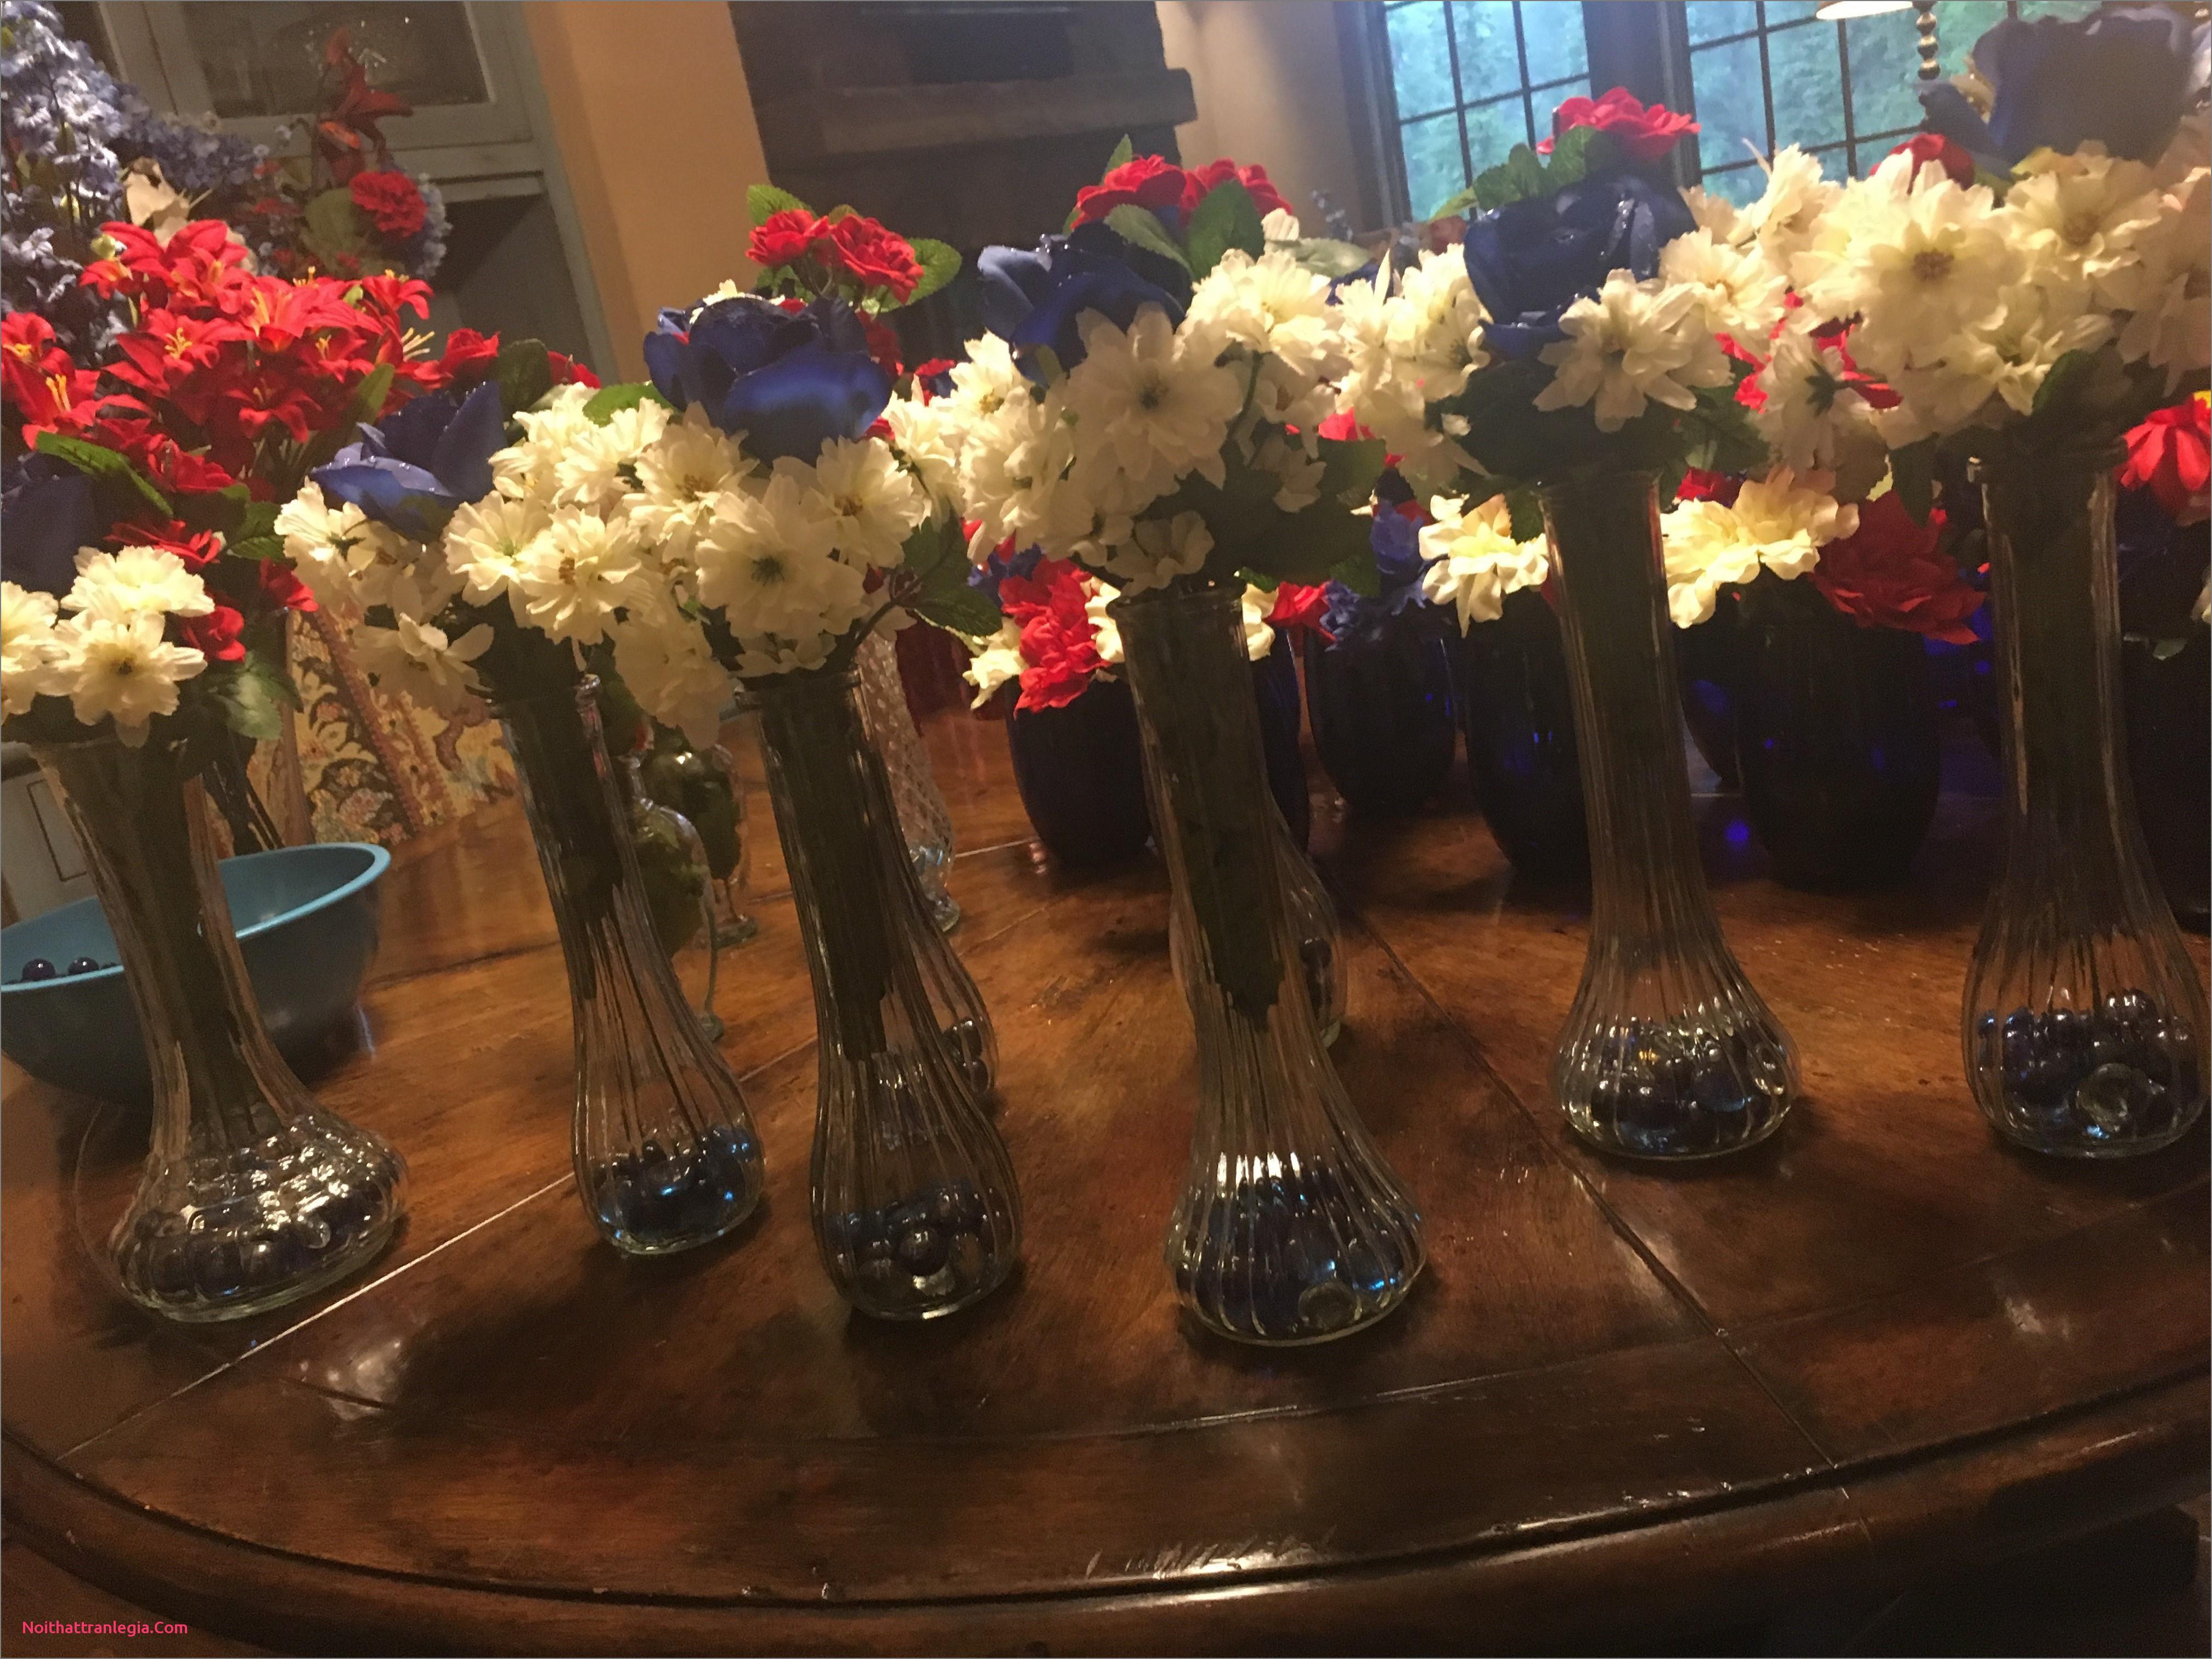 flower and vase decor of 20 wedding vases noithattranlegia vases design regarding decoration line luxury dollar tree wedding decorations awesome h vases dollar vase i 0d